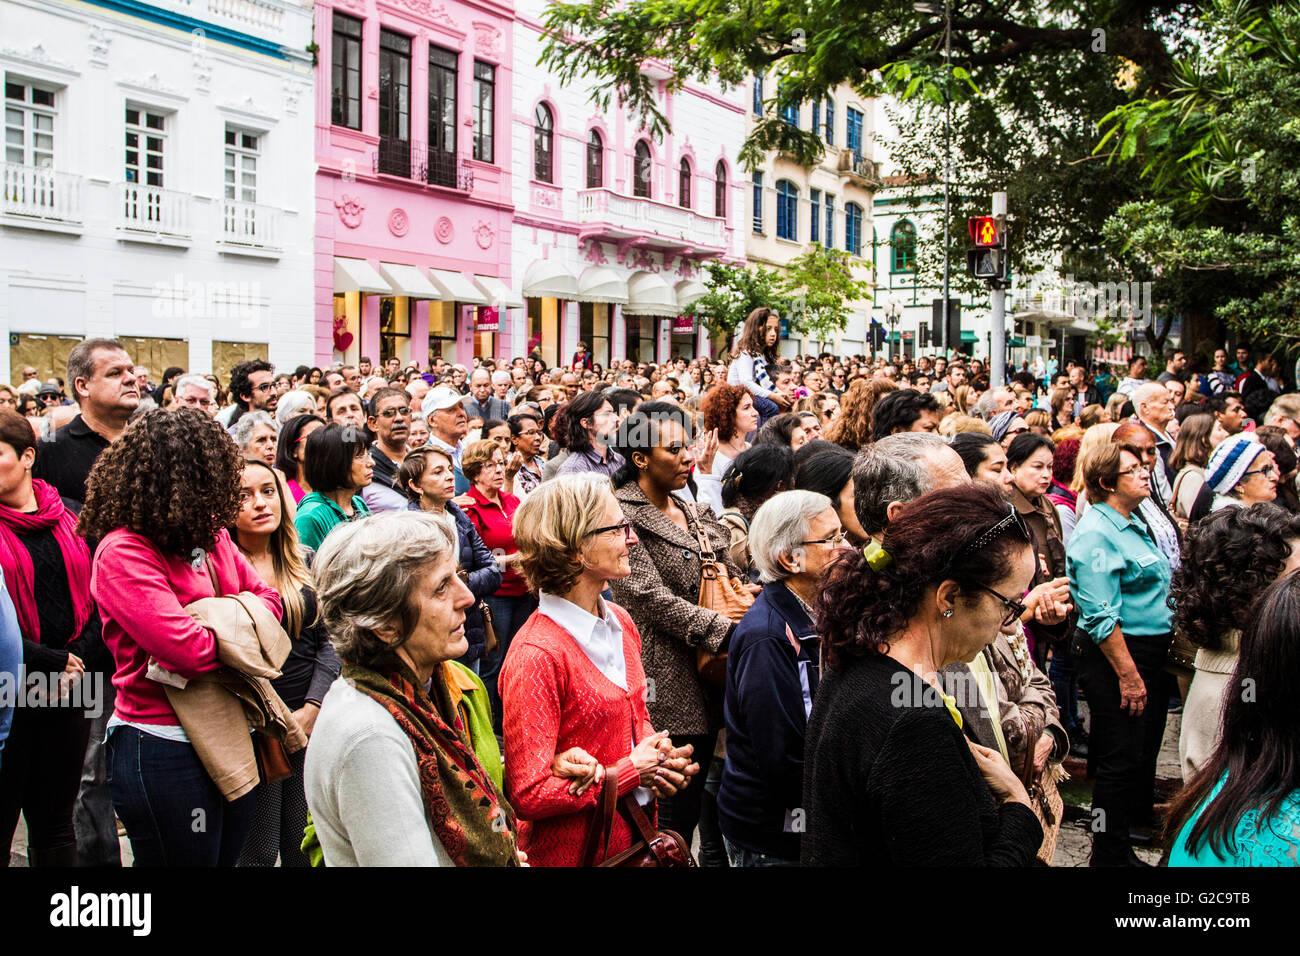 Crowd attending to Corpus Christi Procession. Florianopolis, Santa Catarina, Brazil. - Stock Image